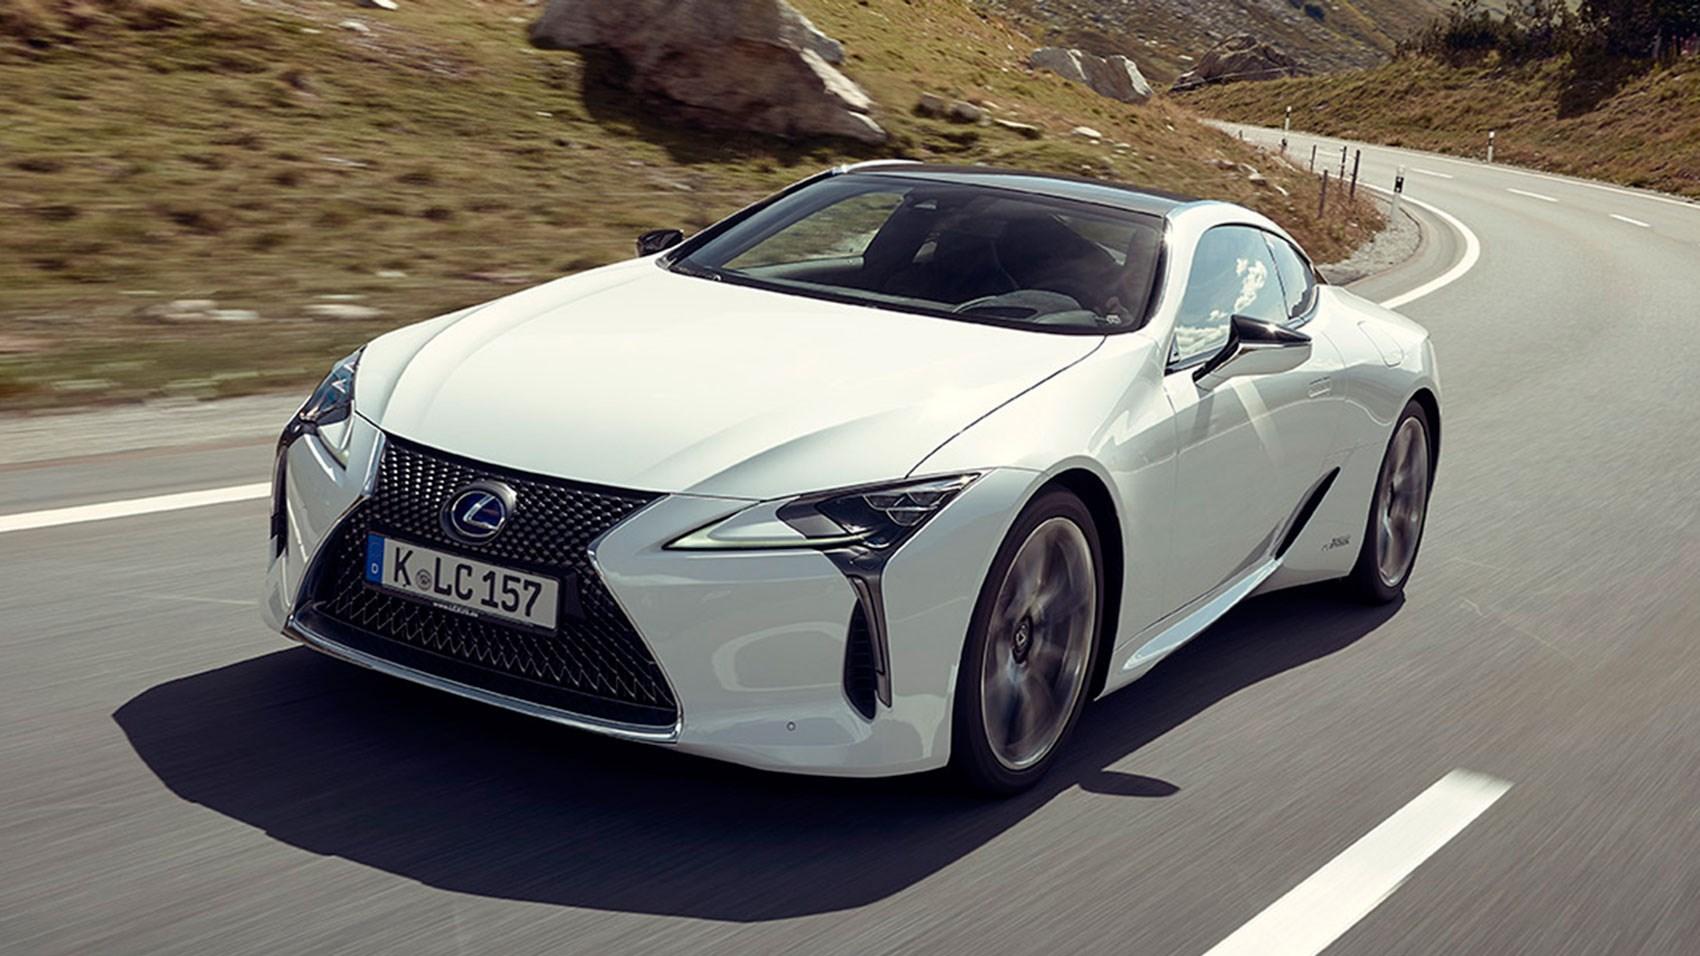 ... Lexus LC500 Review: Meet The Slickest Lexus This Side Of The LFA ...